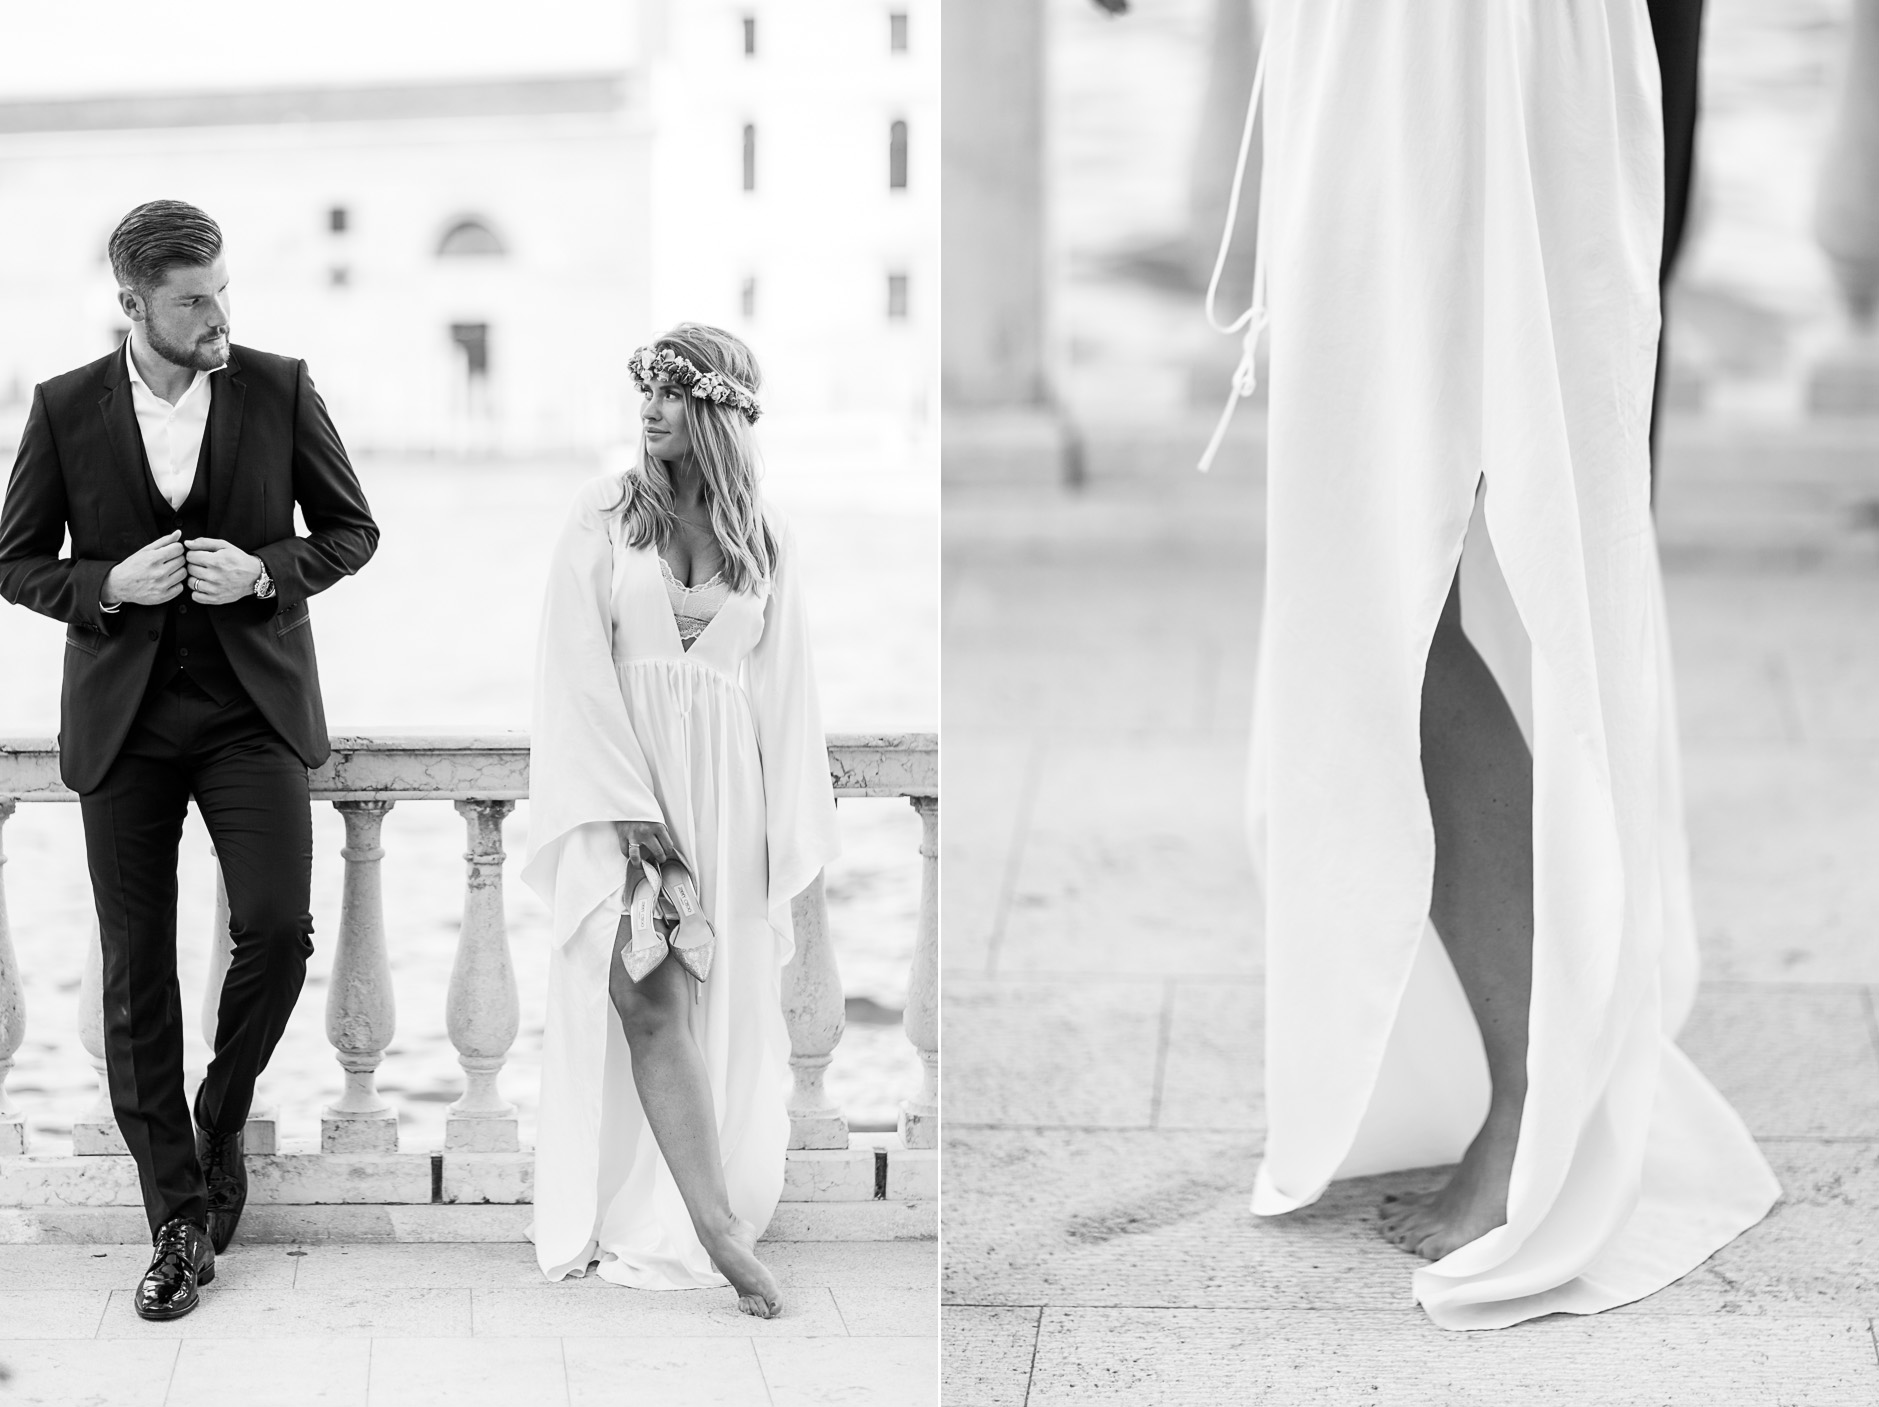 Hochzeitsfotograf Le Hai Linh Boho Chic After Wedding Shooting Venedig Timo Horn 1.FC Koeln 049.jpg